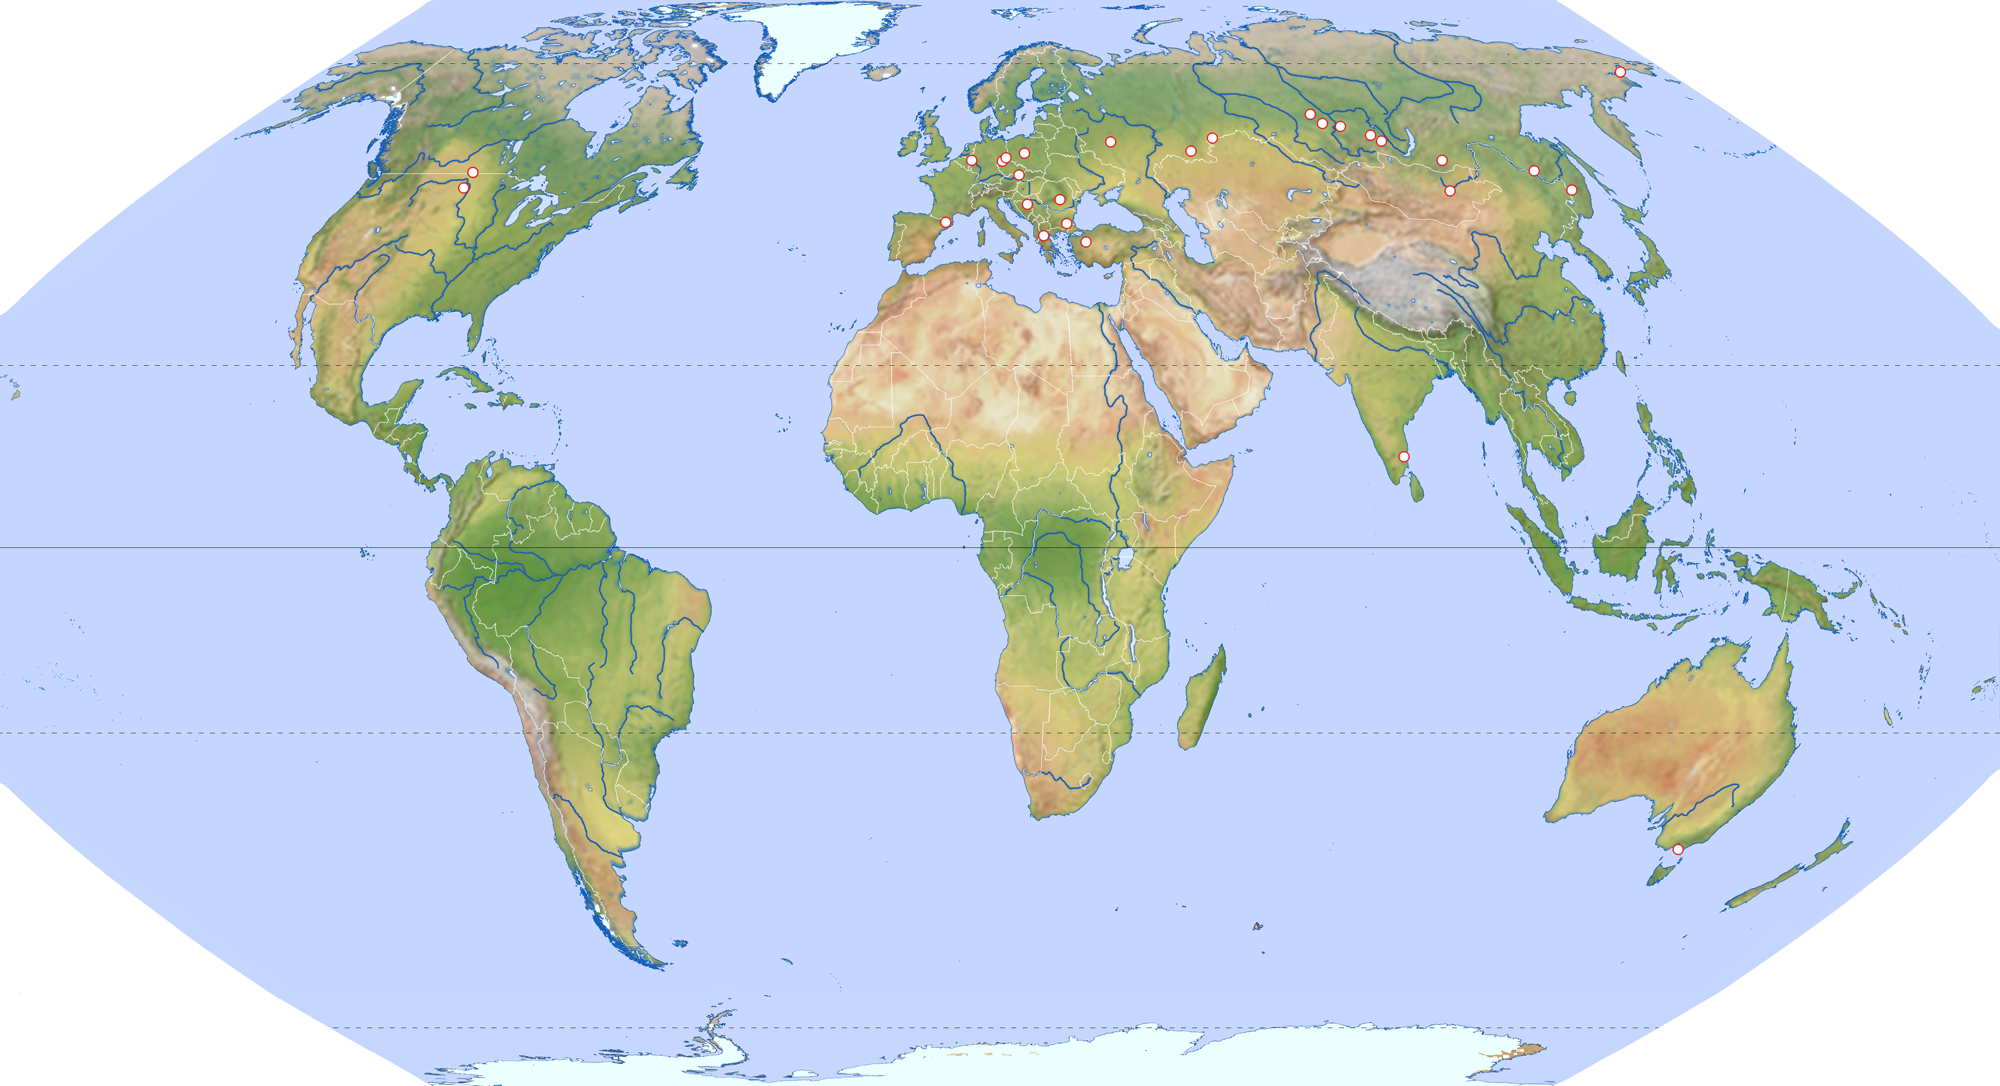 realistische weltkarte File:Weltkarte Braunkohle Förderung.png   Wikimedia Commons realistische weltkarte